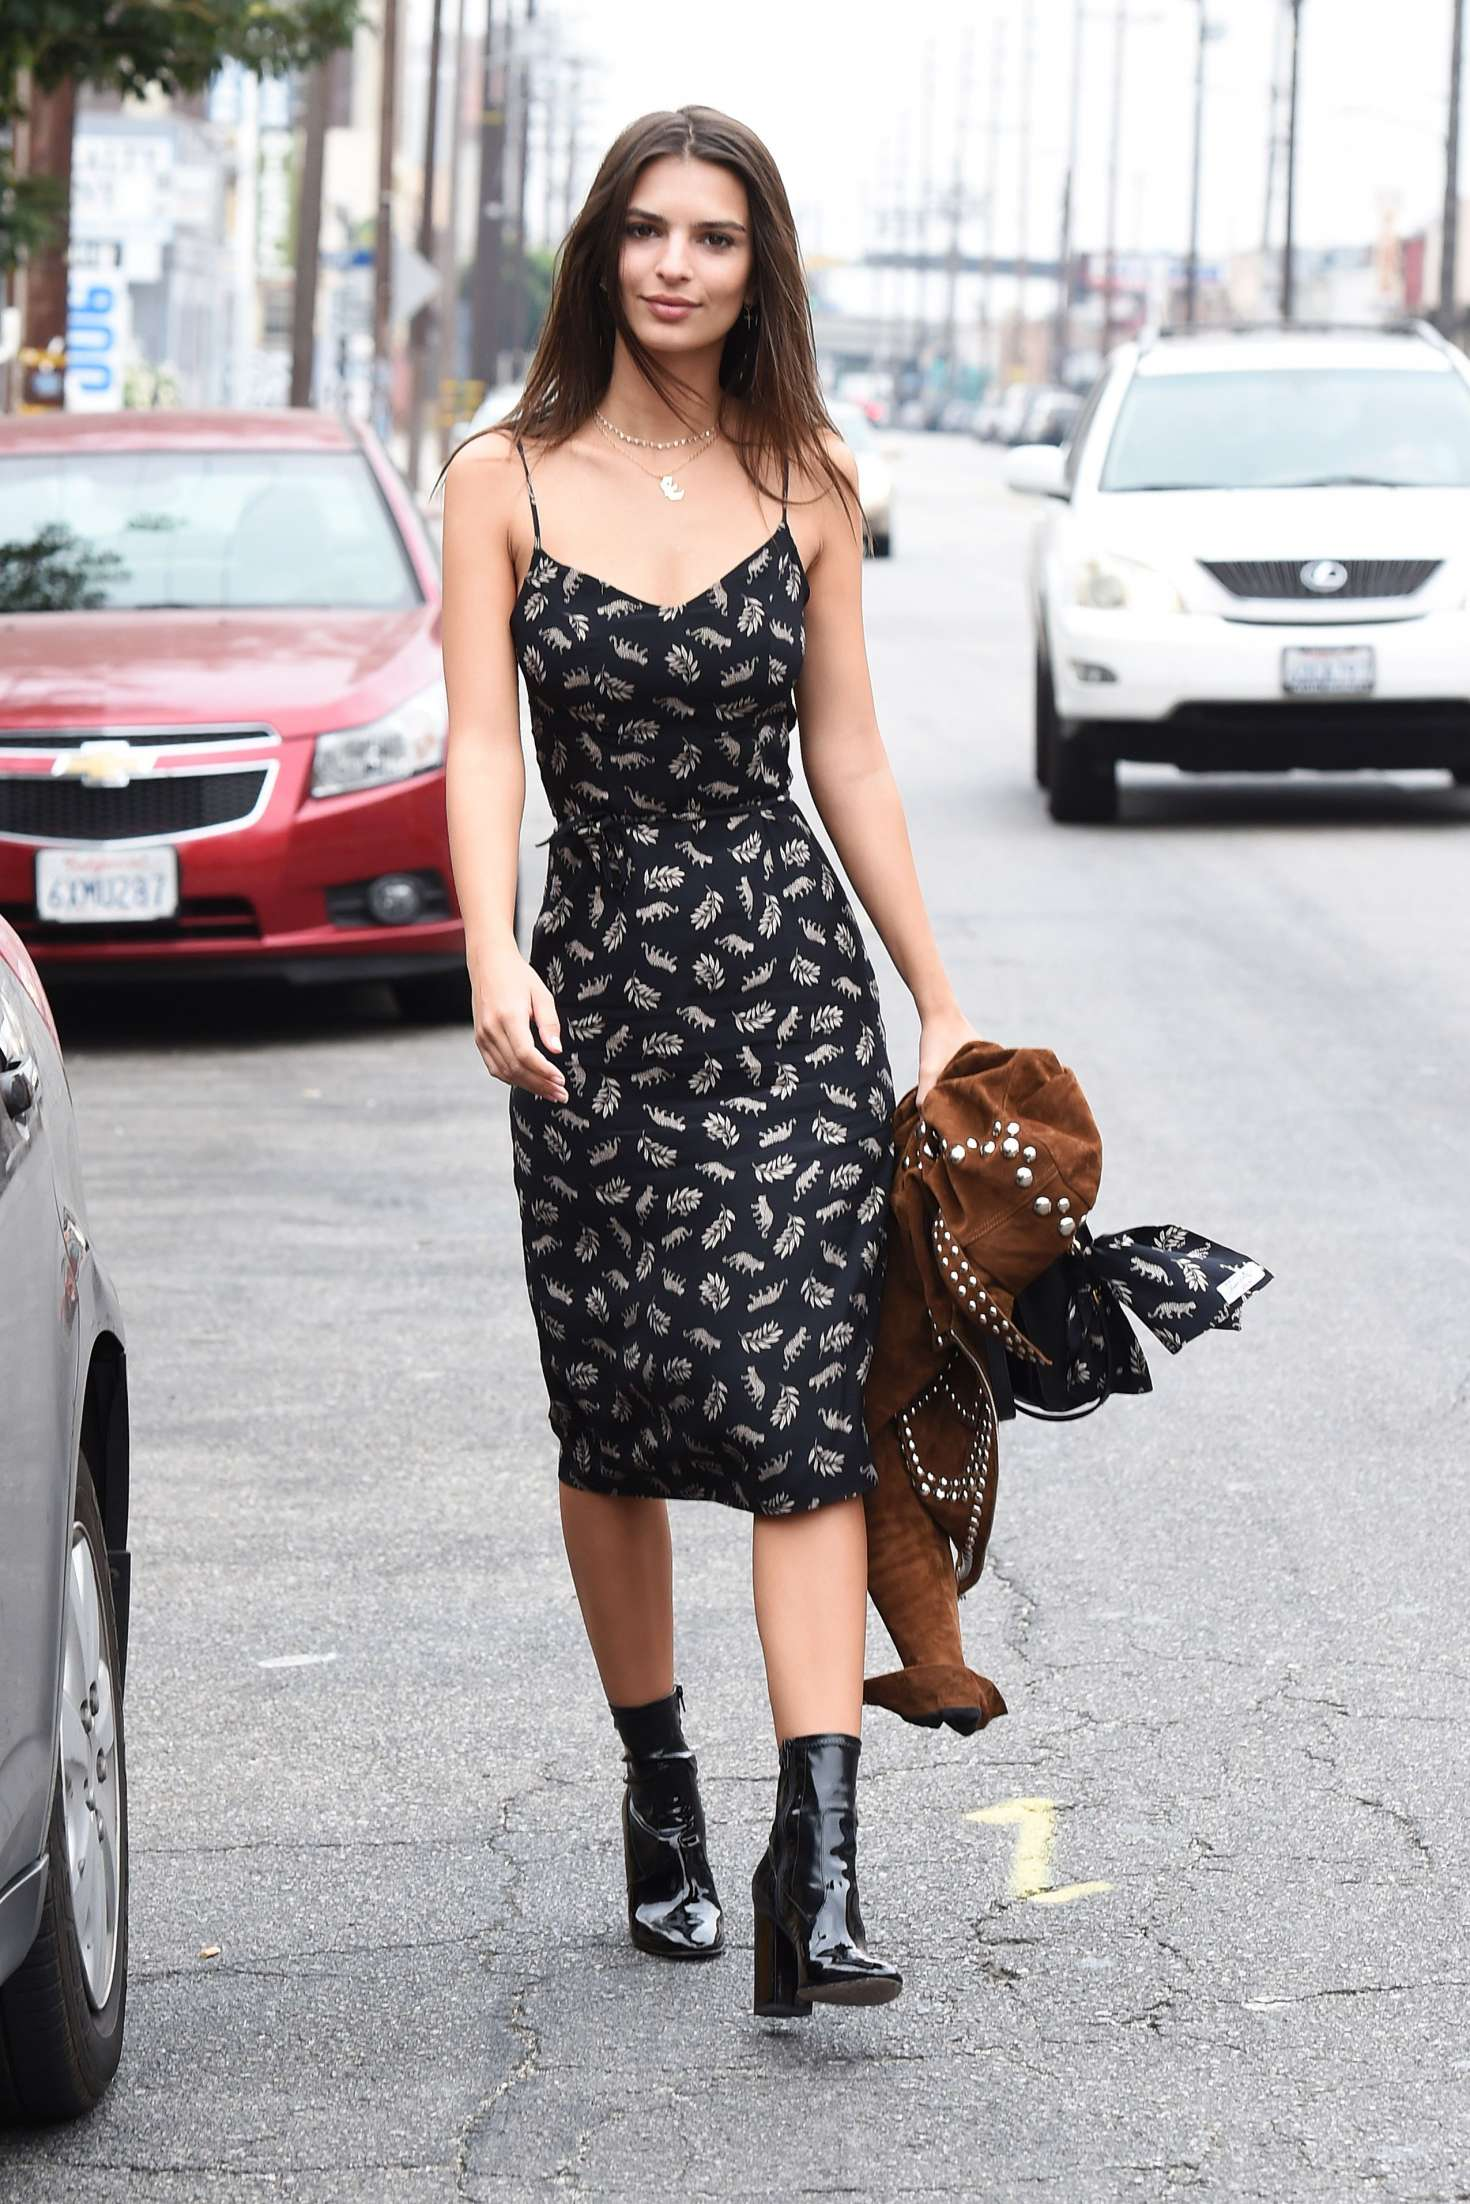 Emily Ratajkowski 2016 : Emily Ratajkowski in Summer Dress -10